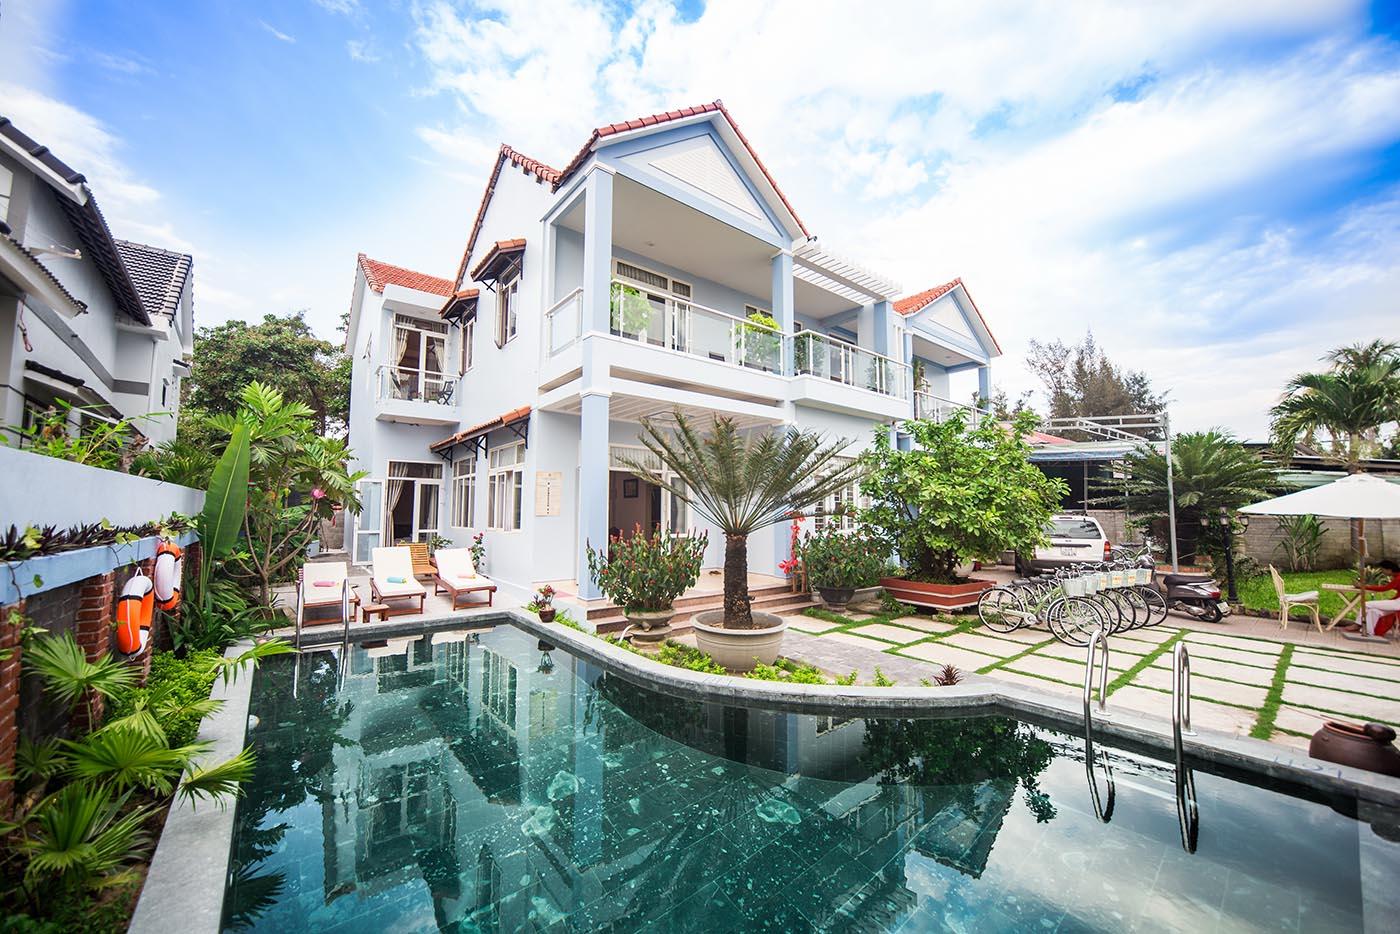 Vy Hoa Hoi An Villas